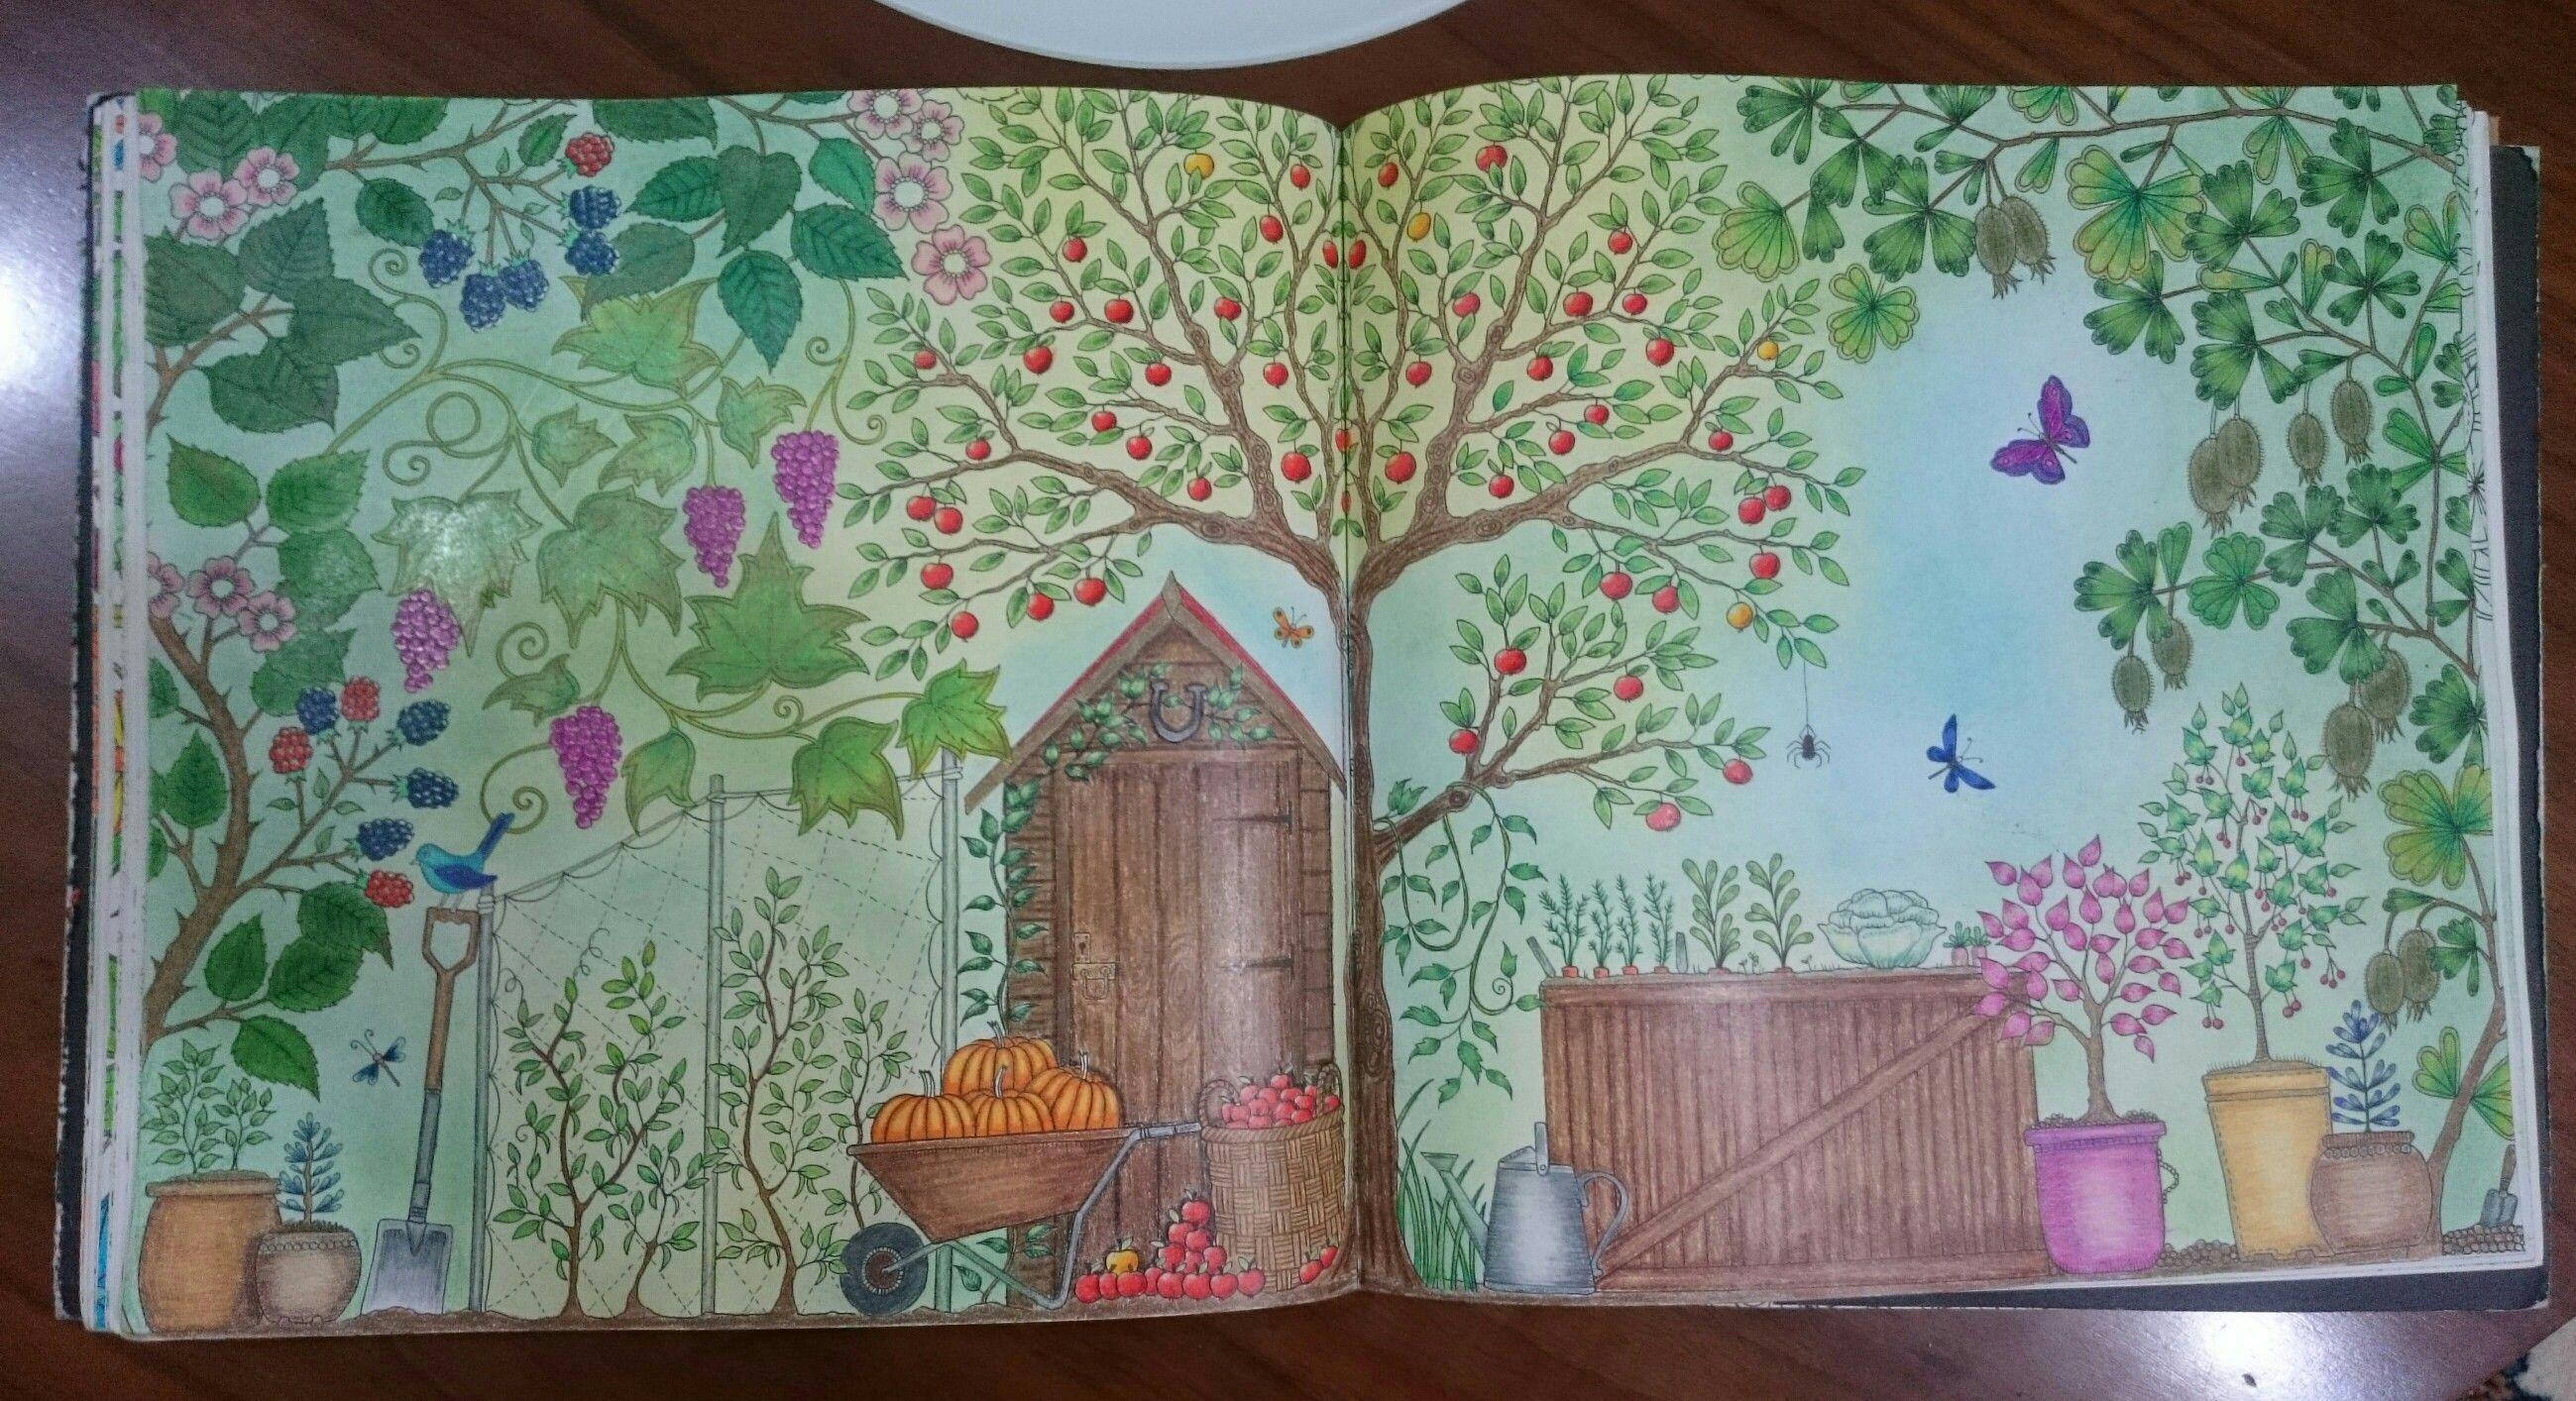 Johanna Basford Secret Garden Esrarengiz Bahce Boyama Kitabi Kabak Uzum Elma Klube Prismacolor Faber Castell Ku Printed Shower Curtain Secret Garden Painting